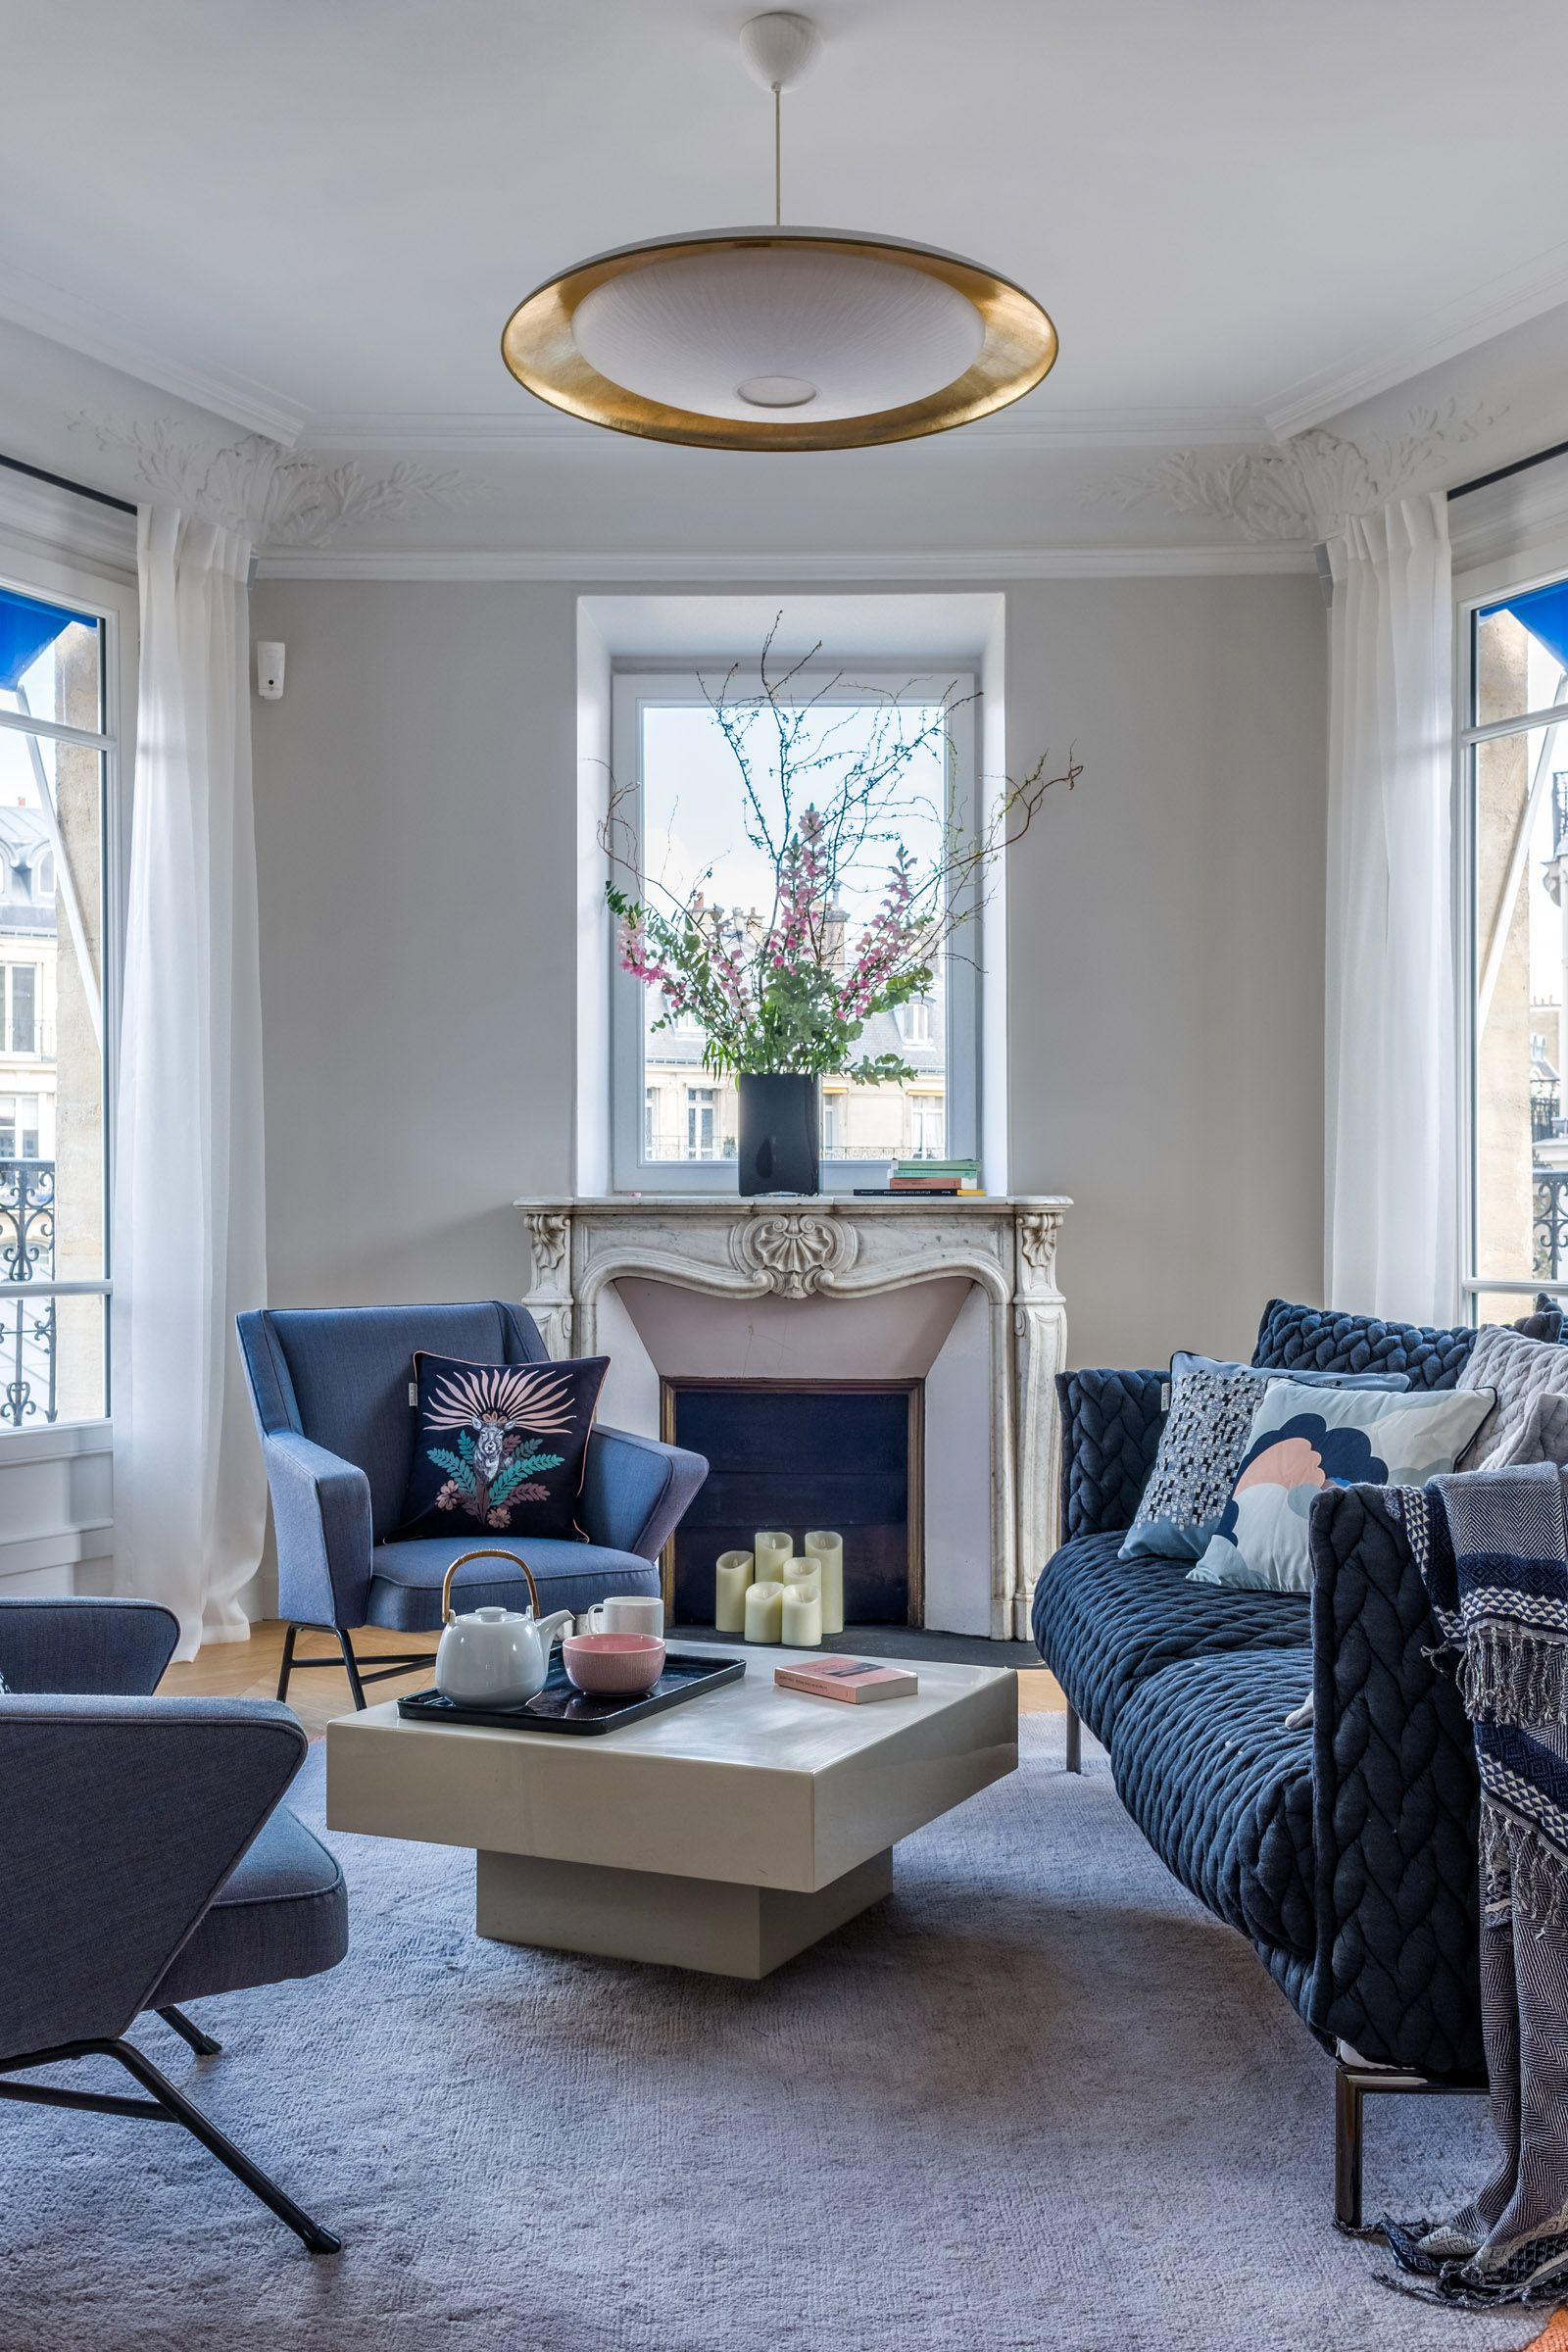 salon boh me chic v ronique cotrel pi ce vivre living room pinterest cloisonnement. Black Bedroom Furniture Sets. Home Design Ideas